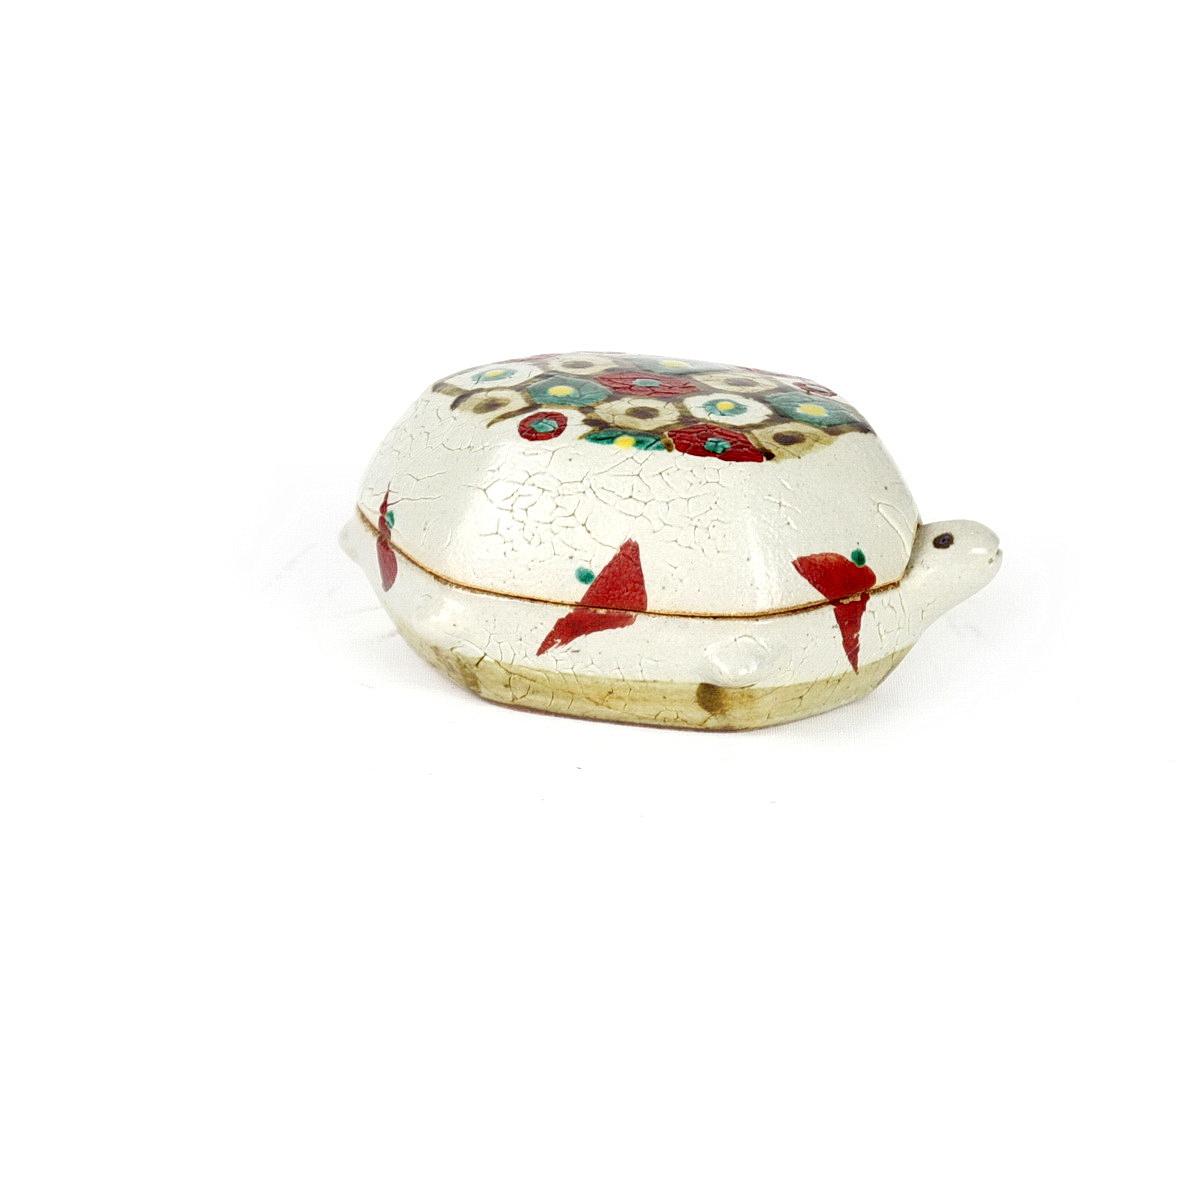 Tomoo Hamada stoneware tutrle shaped box with glaze decoation to the top.